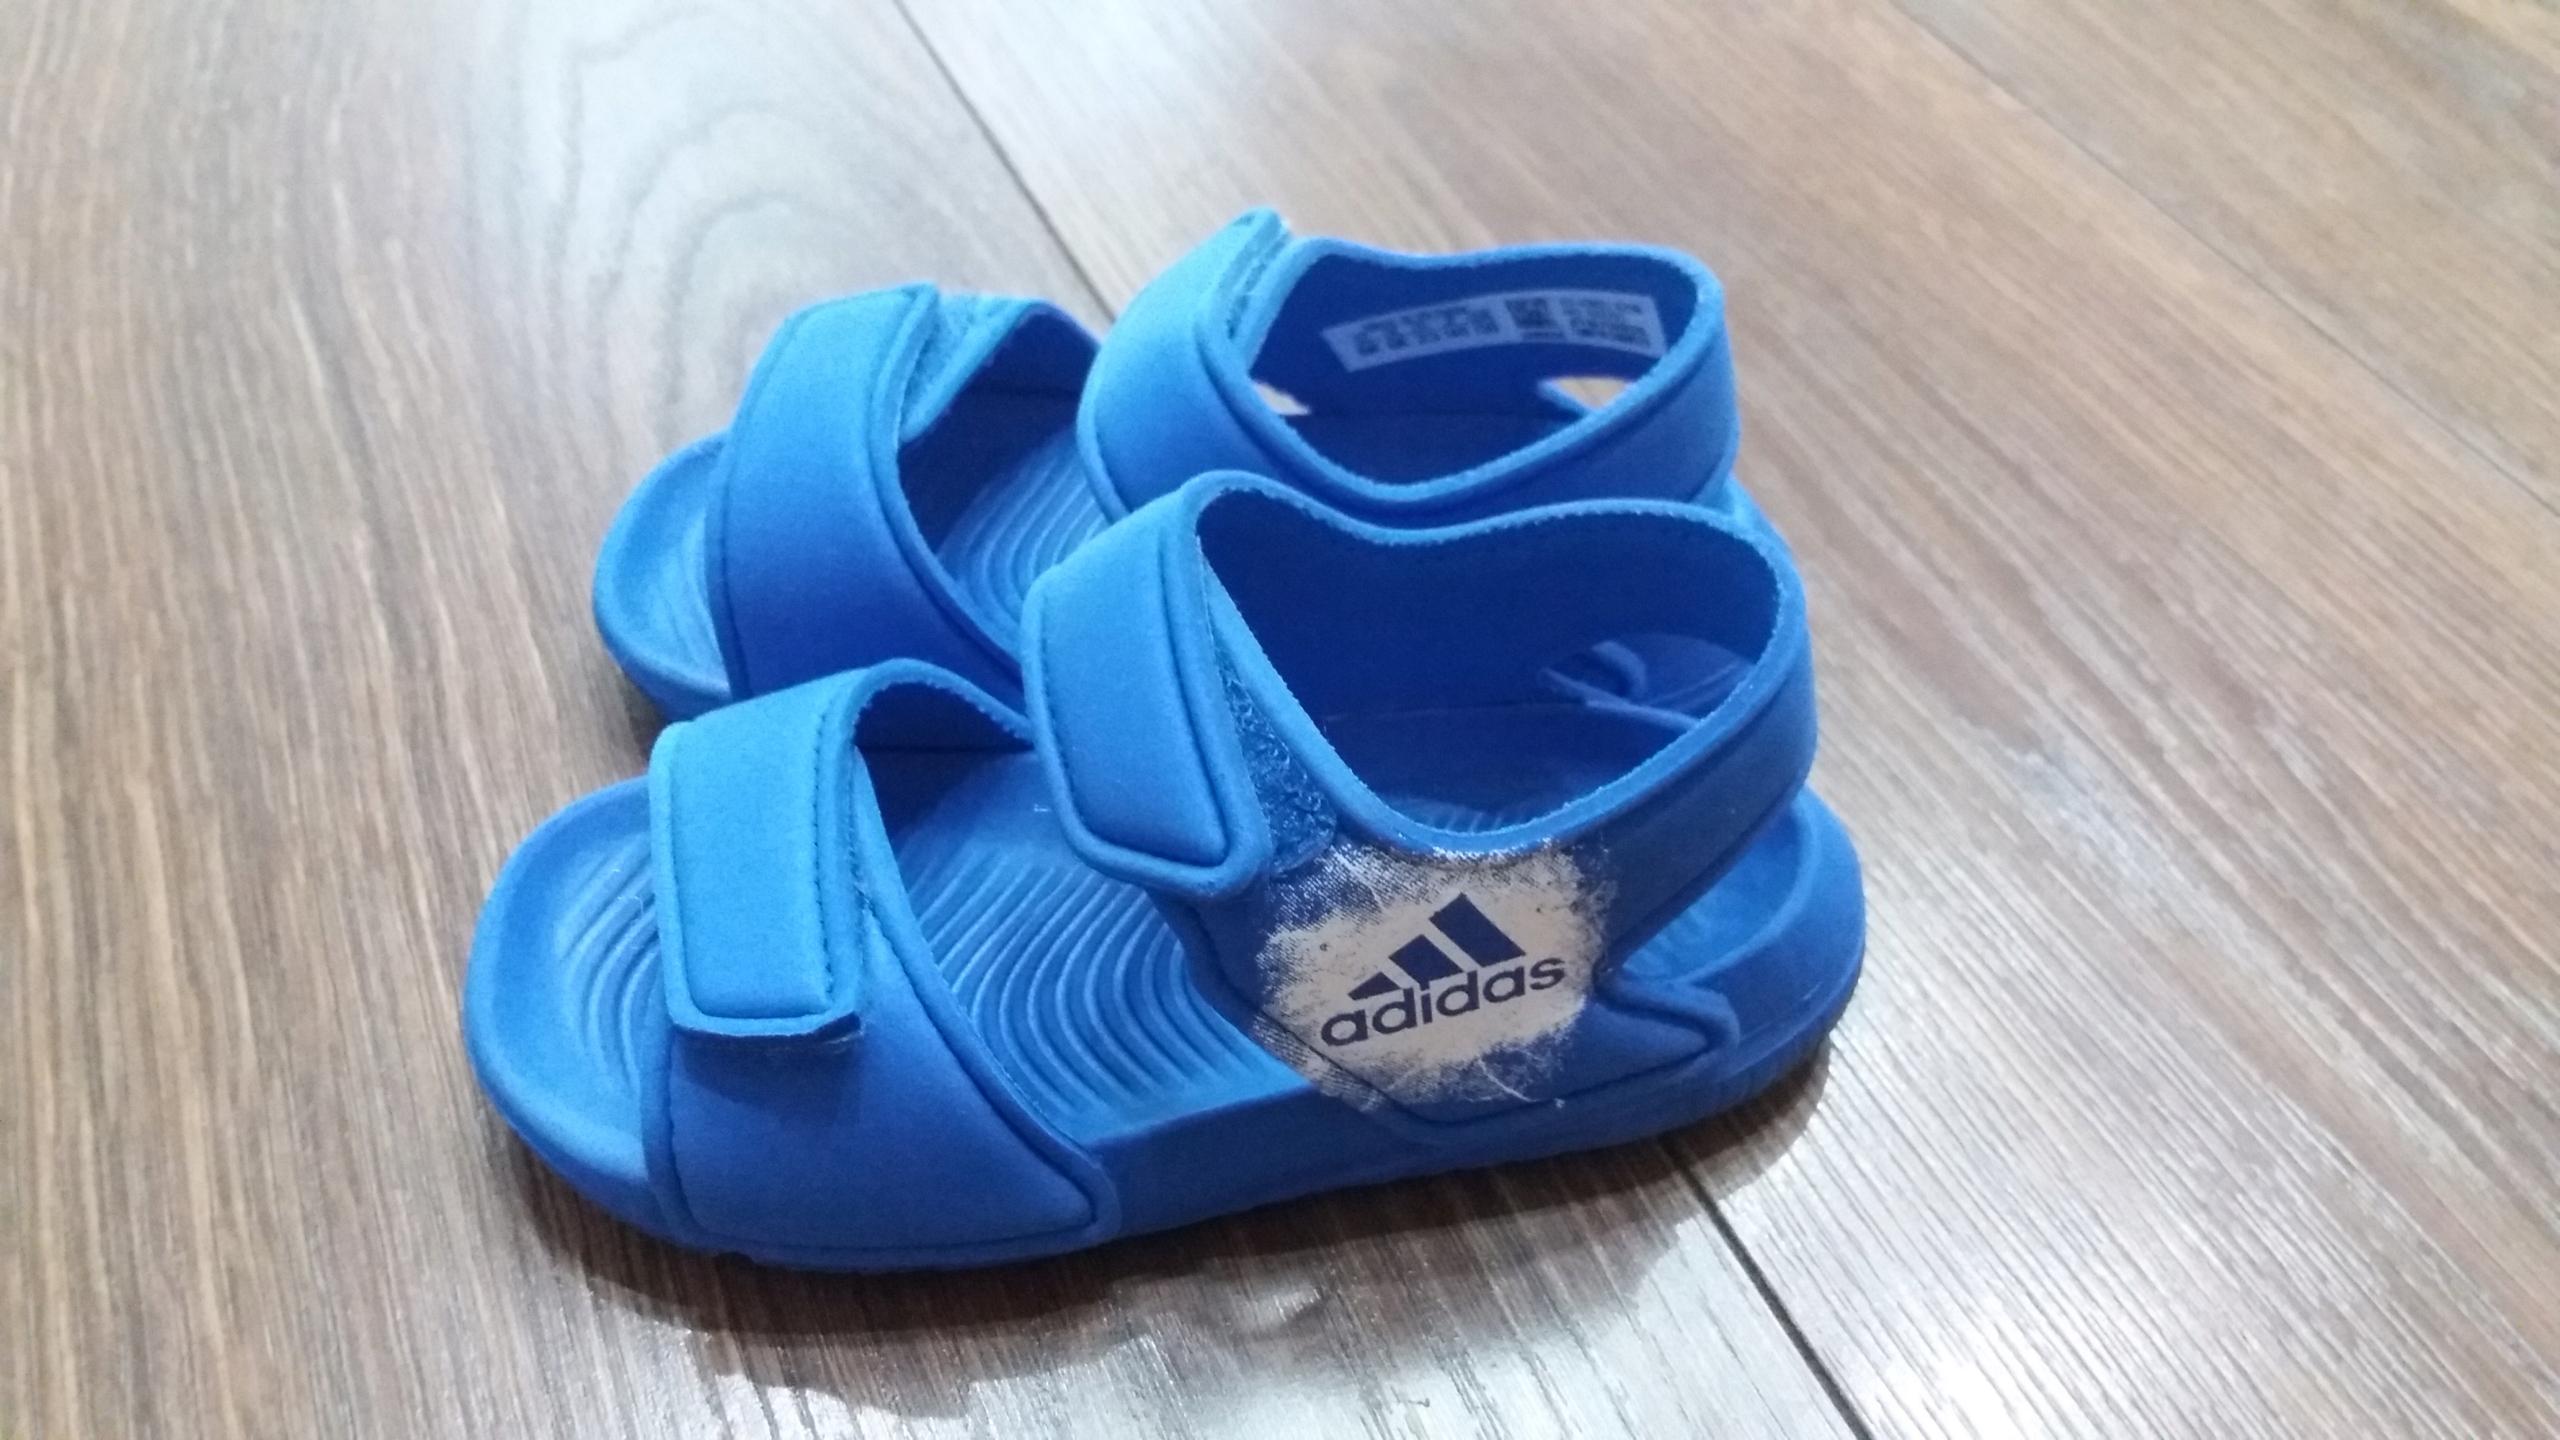 Sandałki Adidas rozmiar 23 wkładka 14 cm